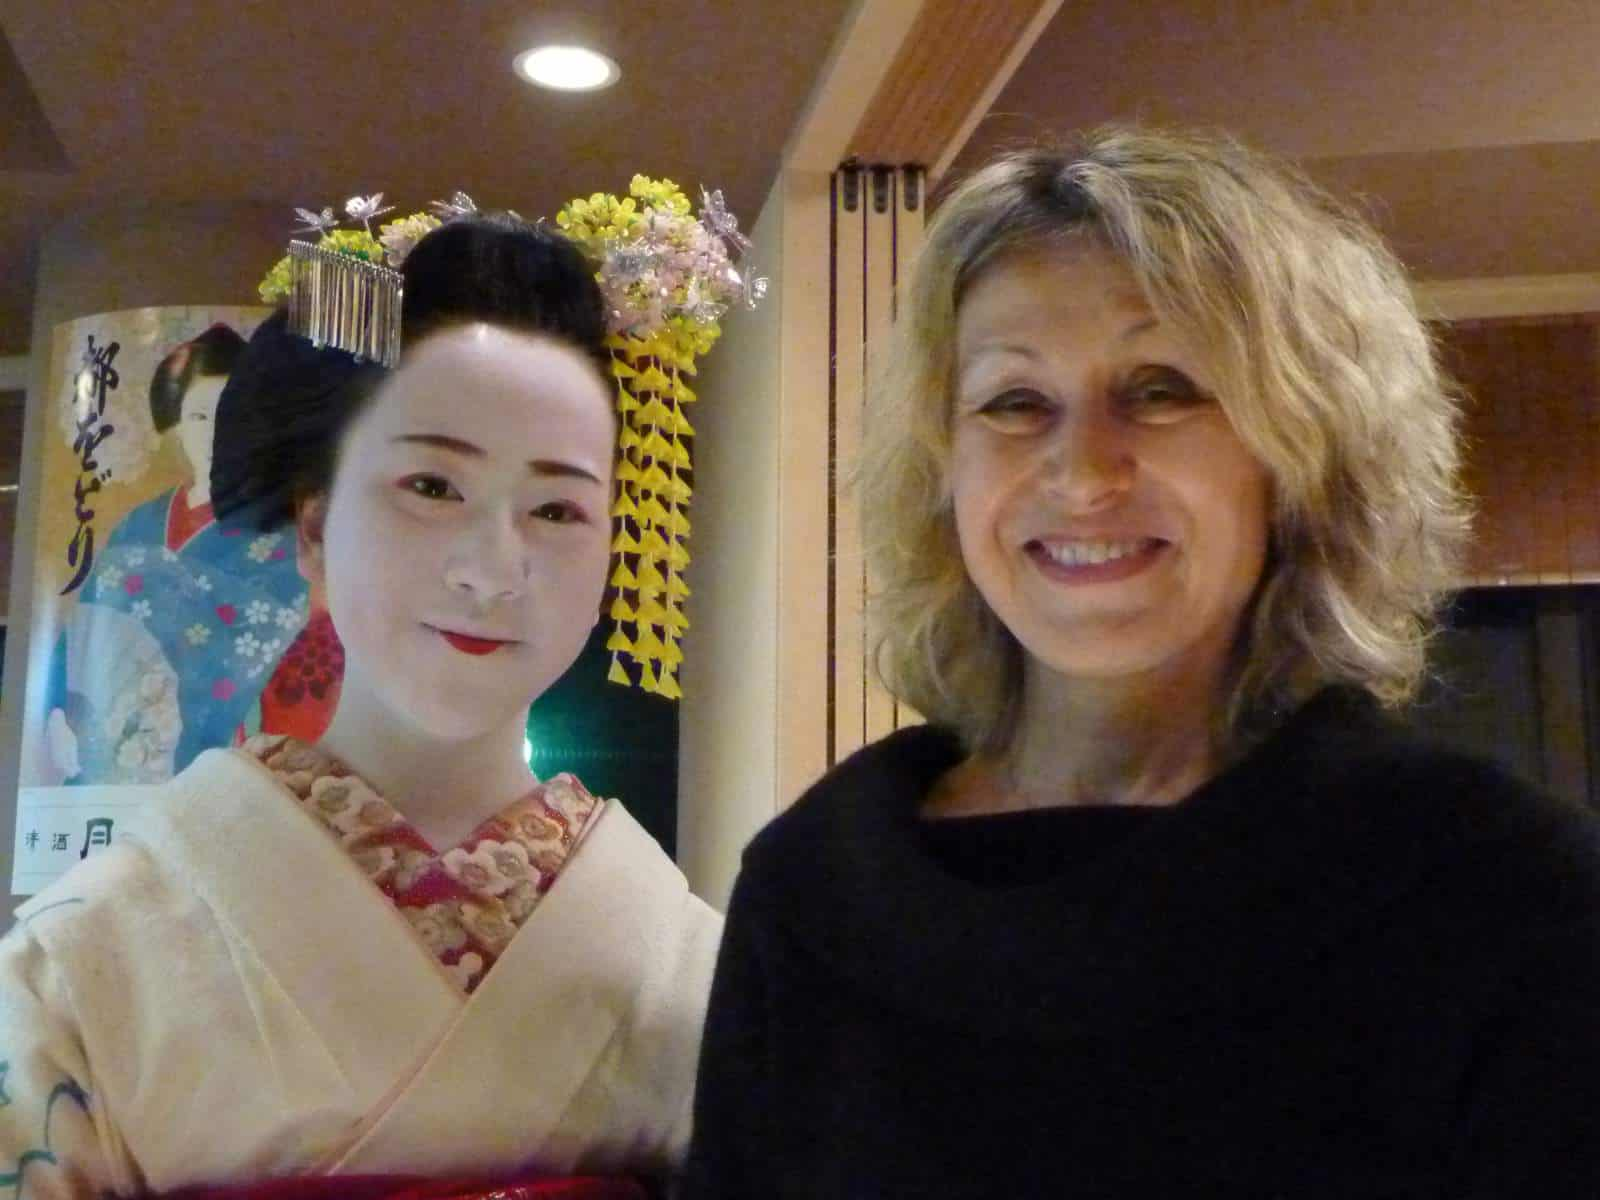 Me with a maiko (trainee geisha) called Mame-chan